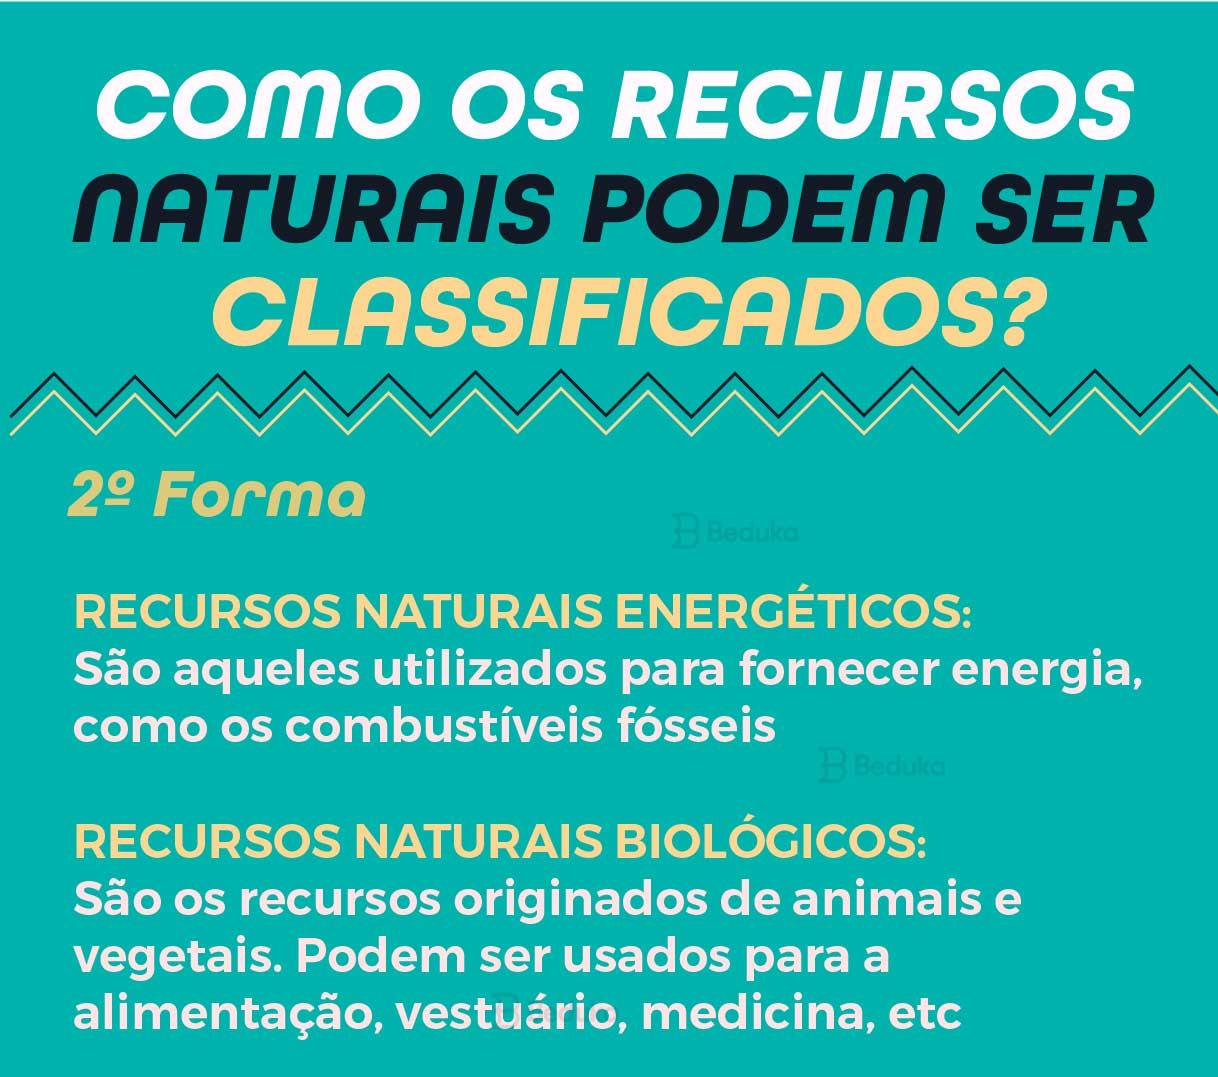 segunda forma de classificar os recursos naturais brasileiros